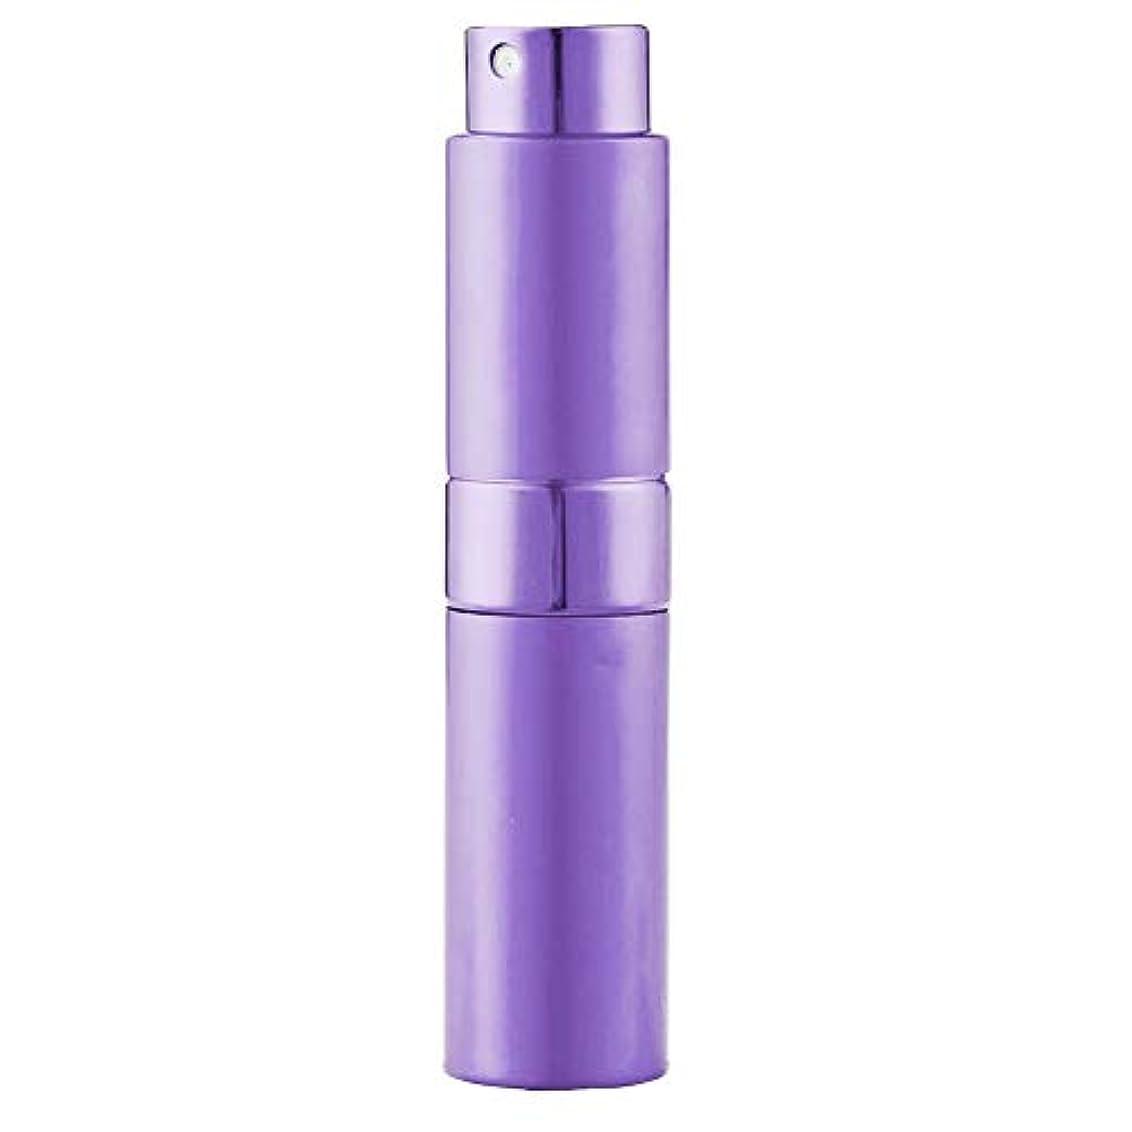 Ladygogo 香水アトマイザーセット 回転プッシュ式 スプレー ボトル 香水スプレー 詰め替え 持ち運び 身だしなみ 携帯用 男女兼用 (紫)